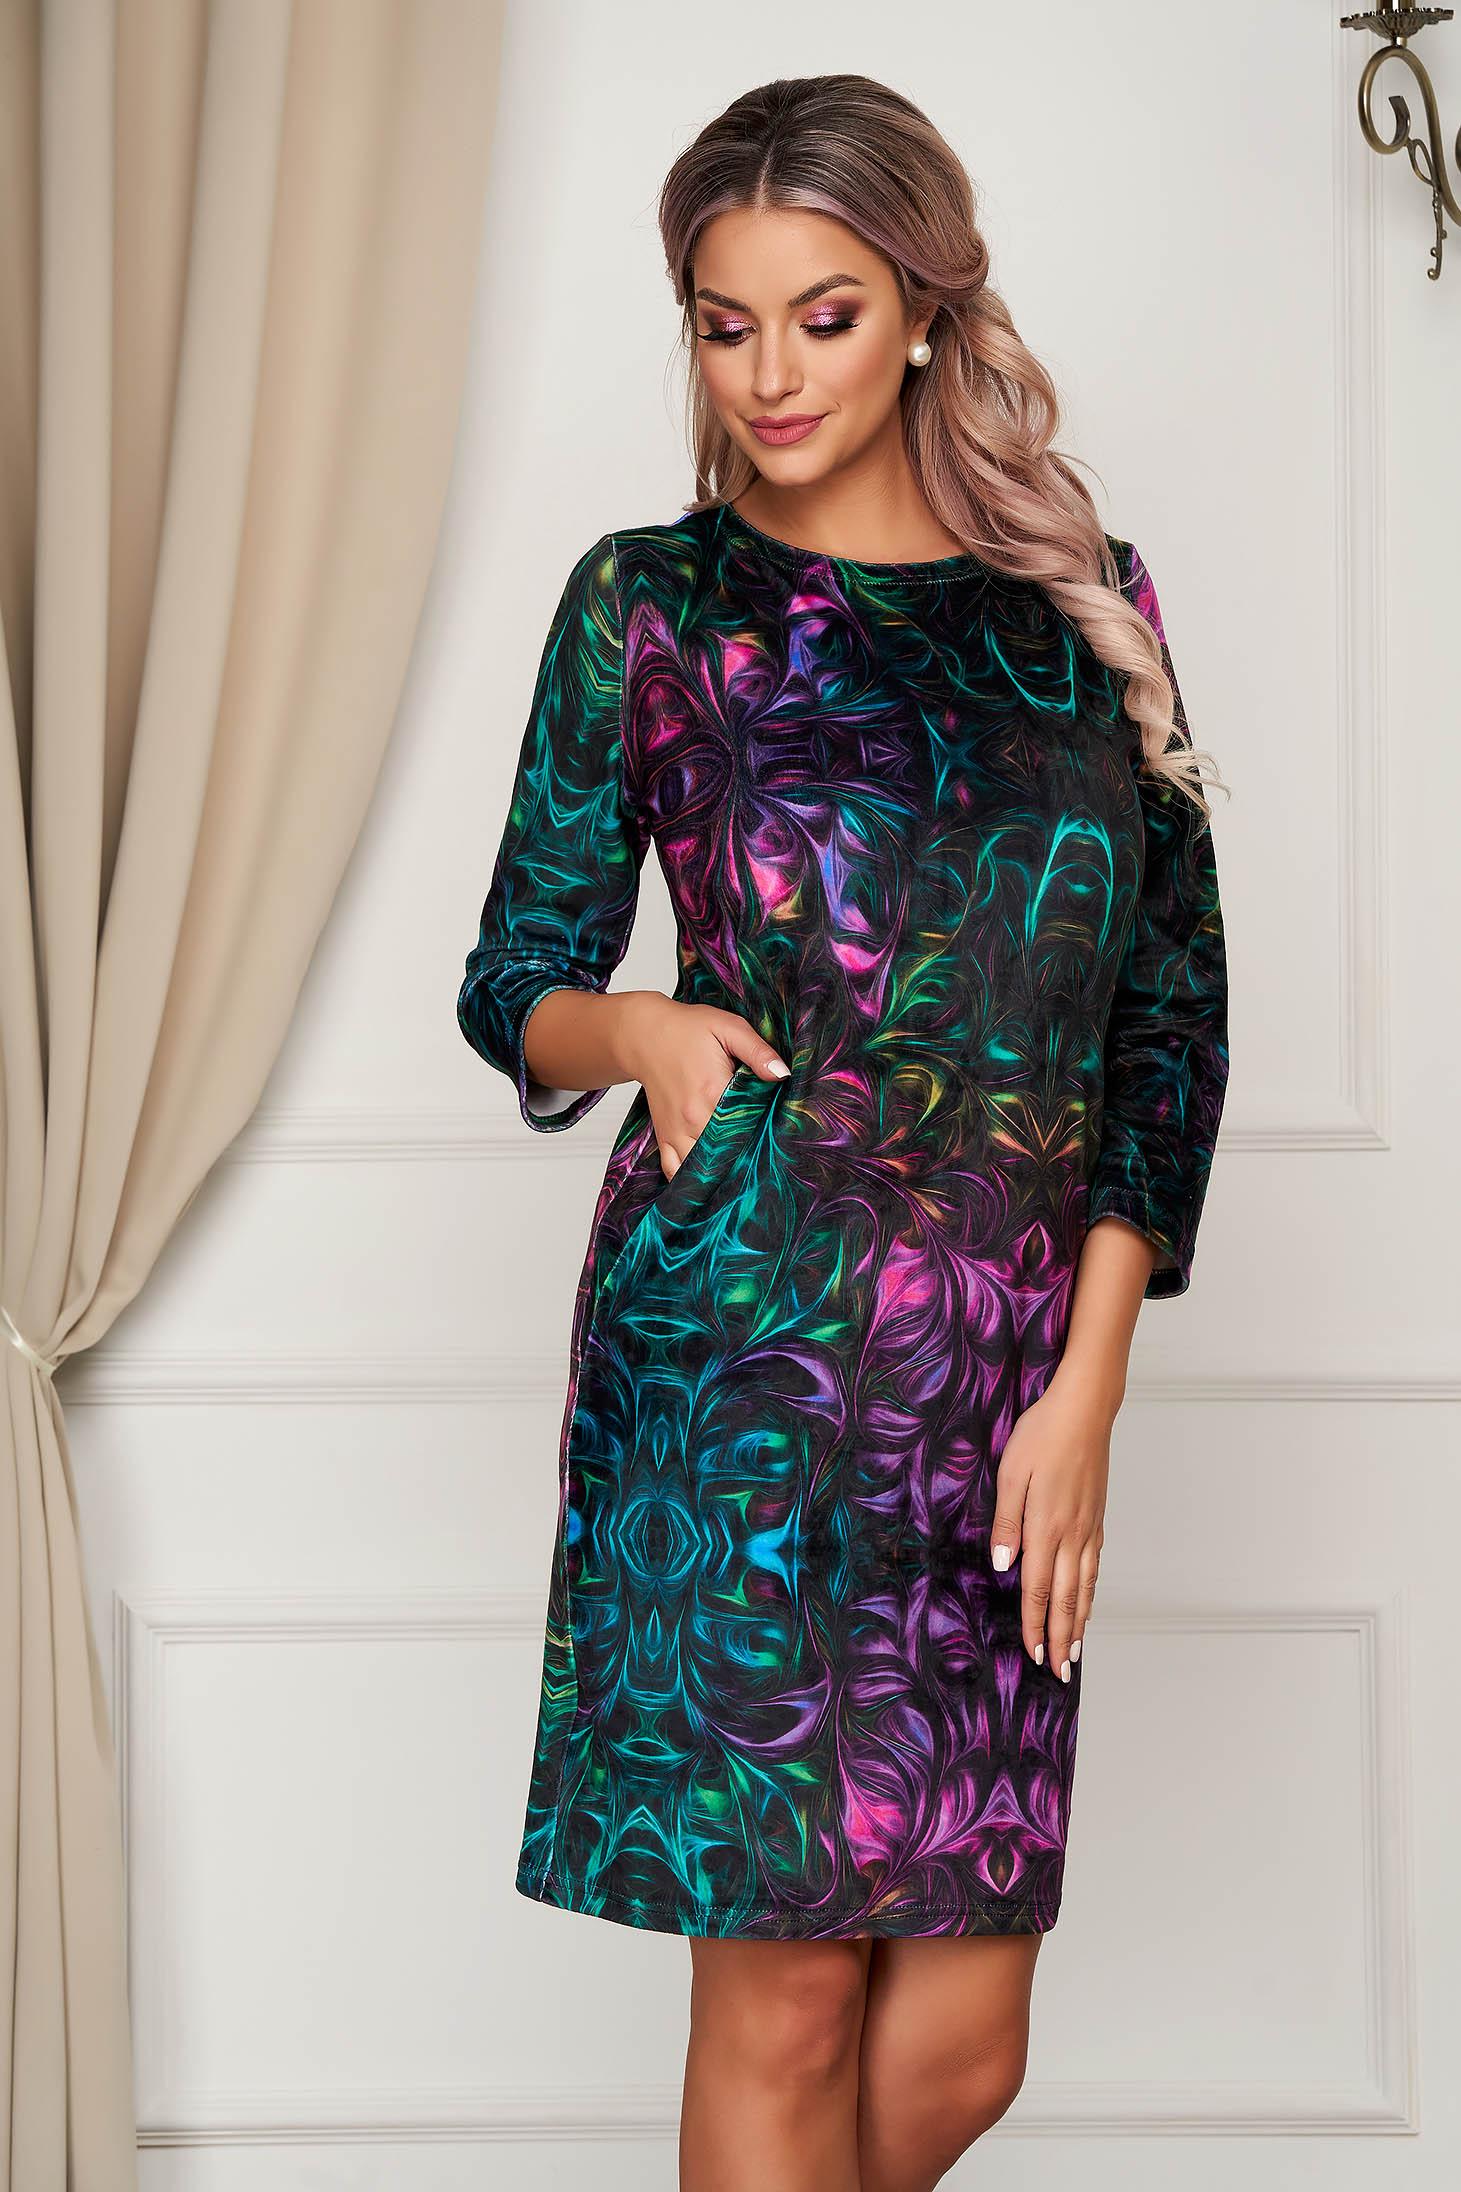 Dress short cut daily straight from velvet fabric